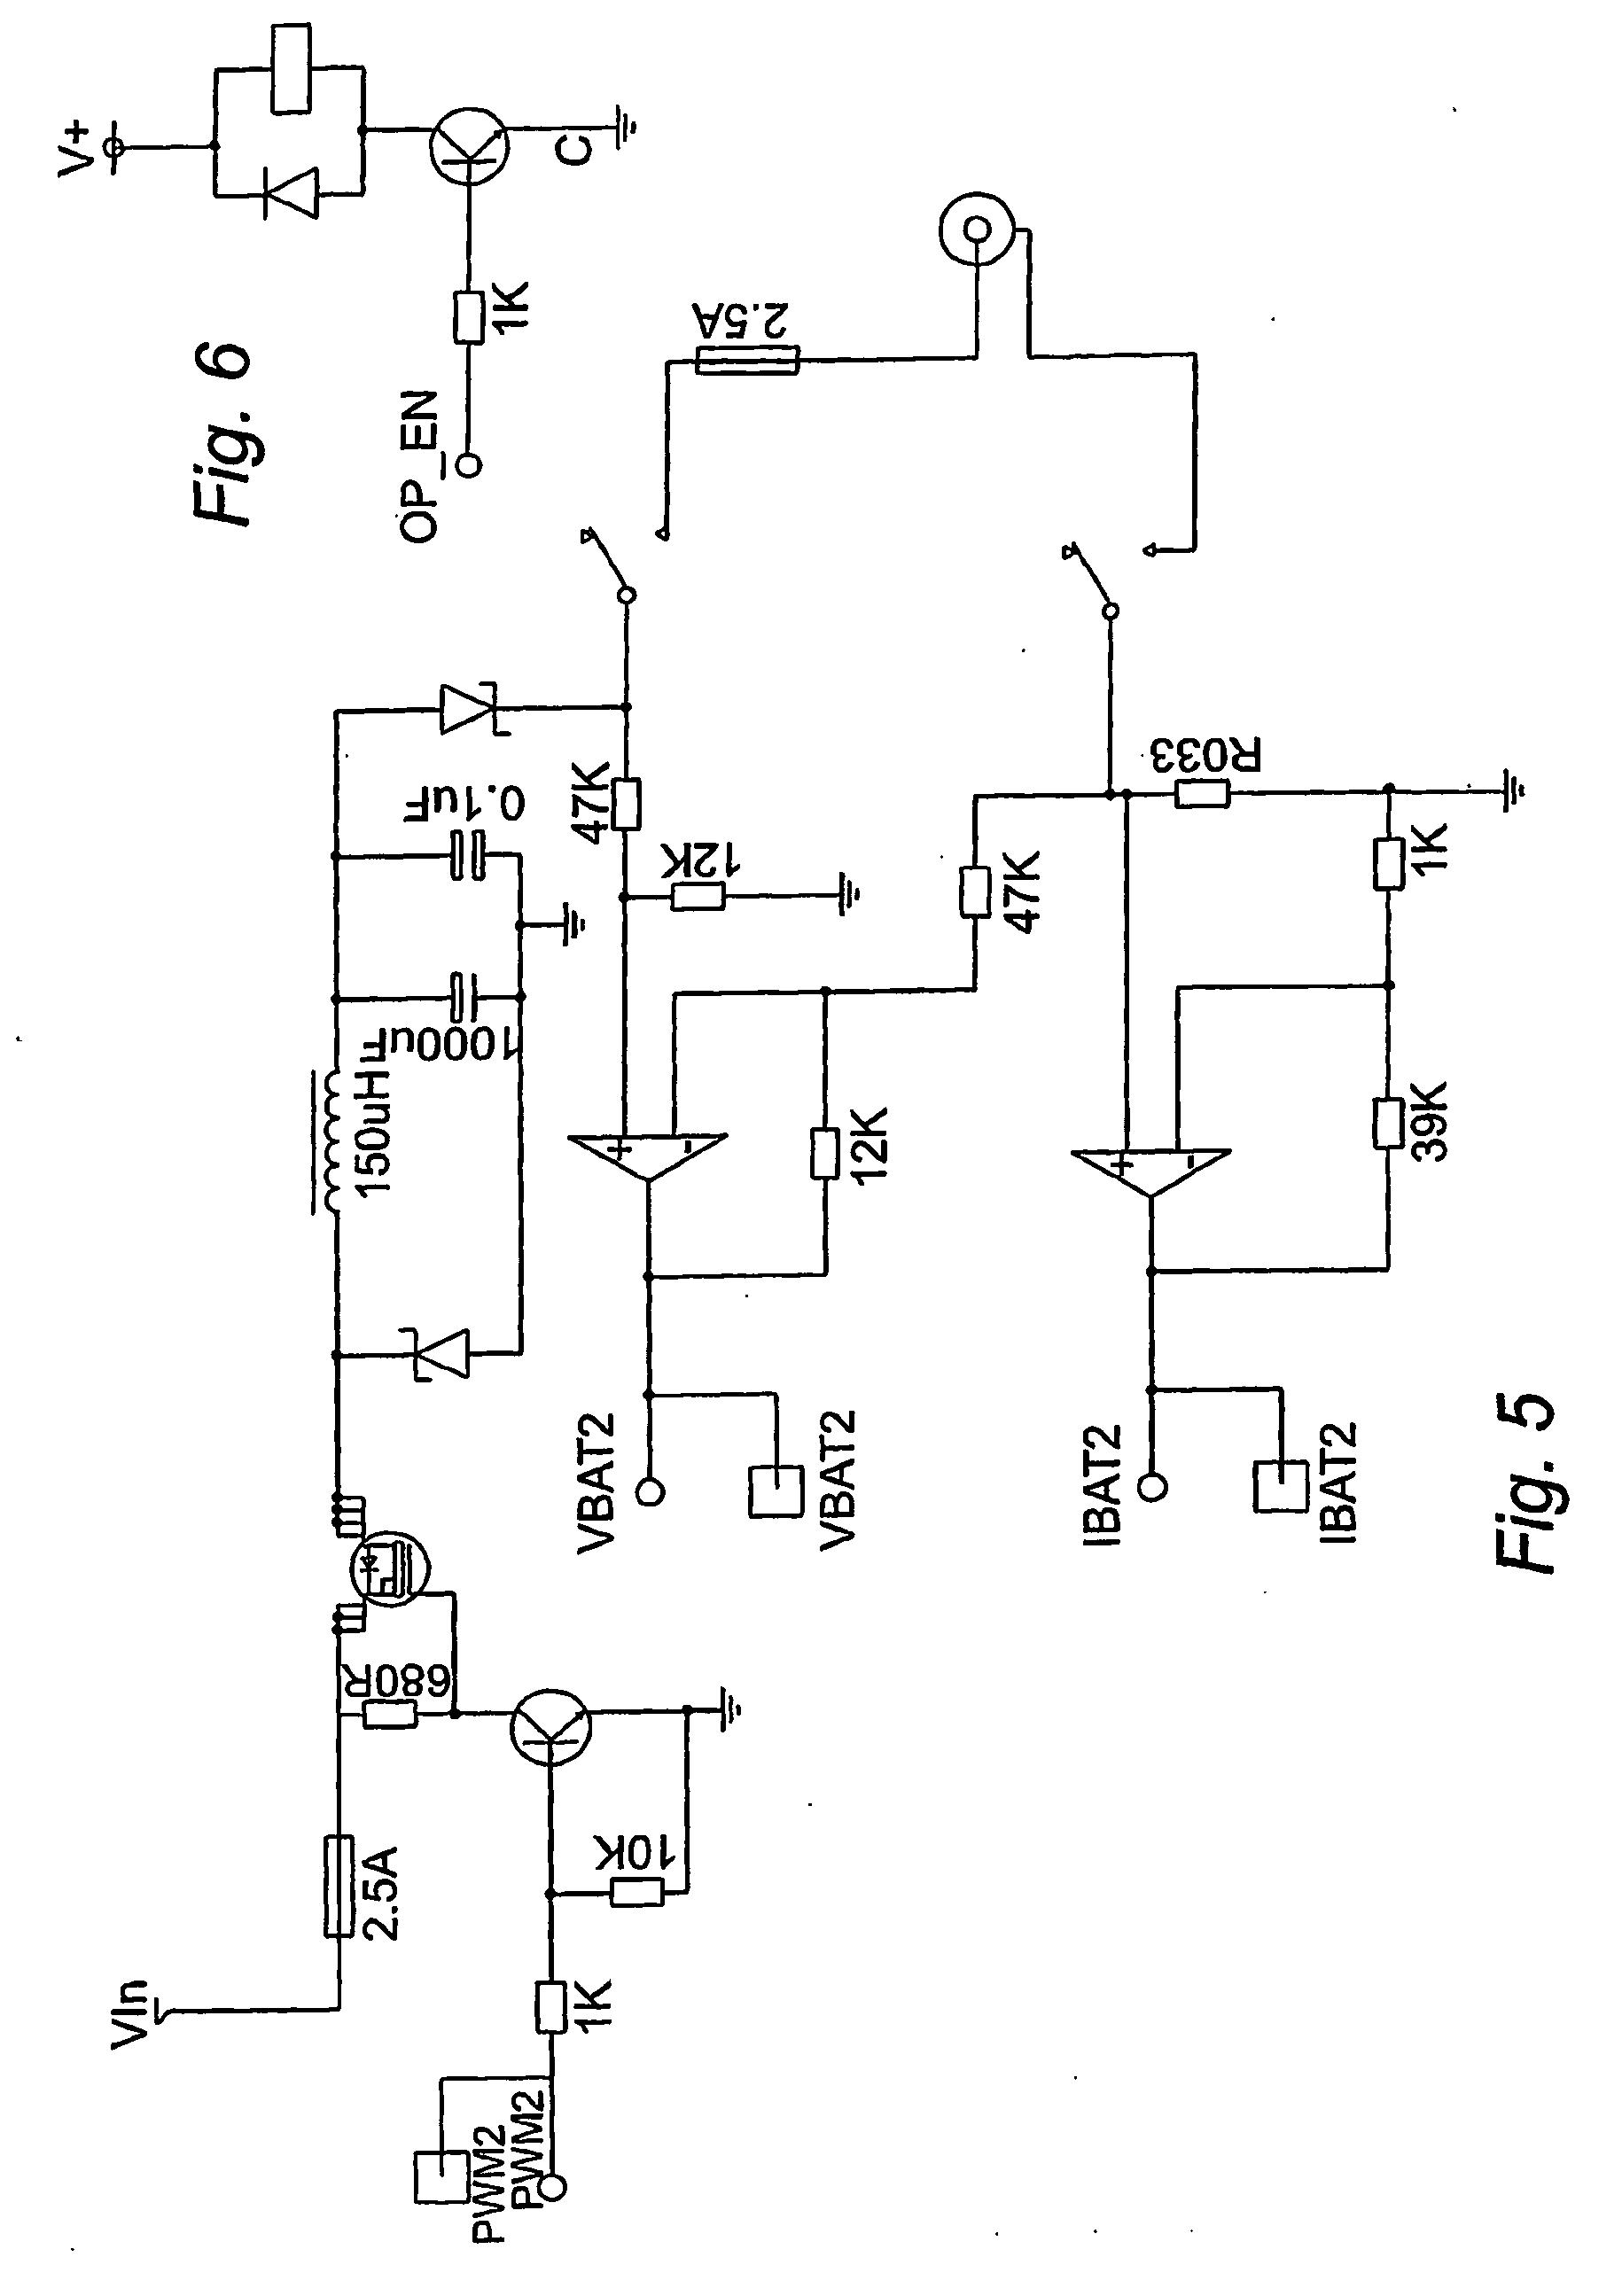 hight resolution of powakaddy wiring diagram lynx wiring diagram elsavadorla automotive wiring diagram symbol meanings vehicle wiring diagram legend